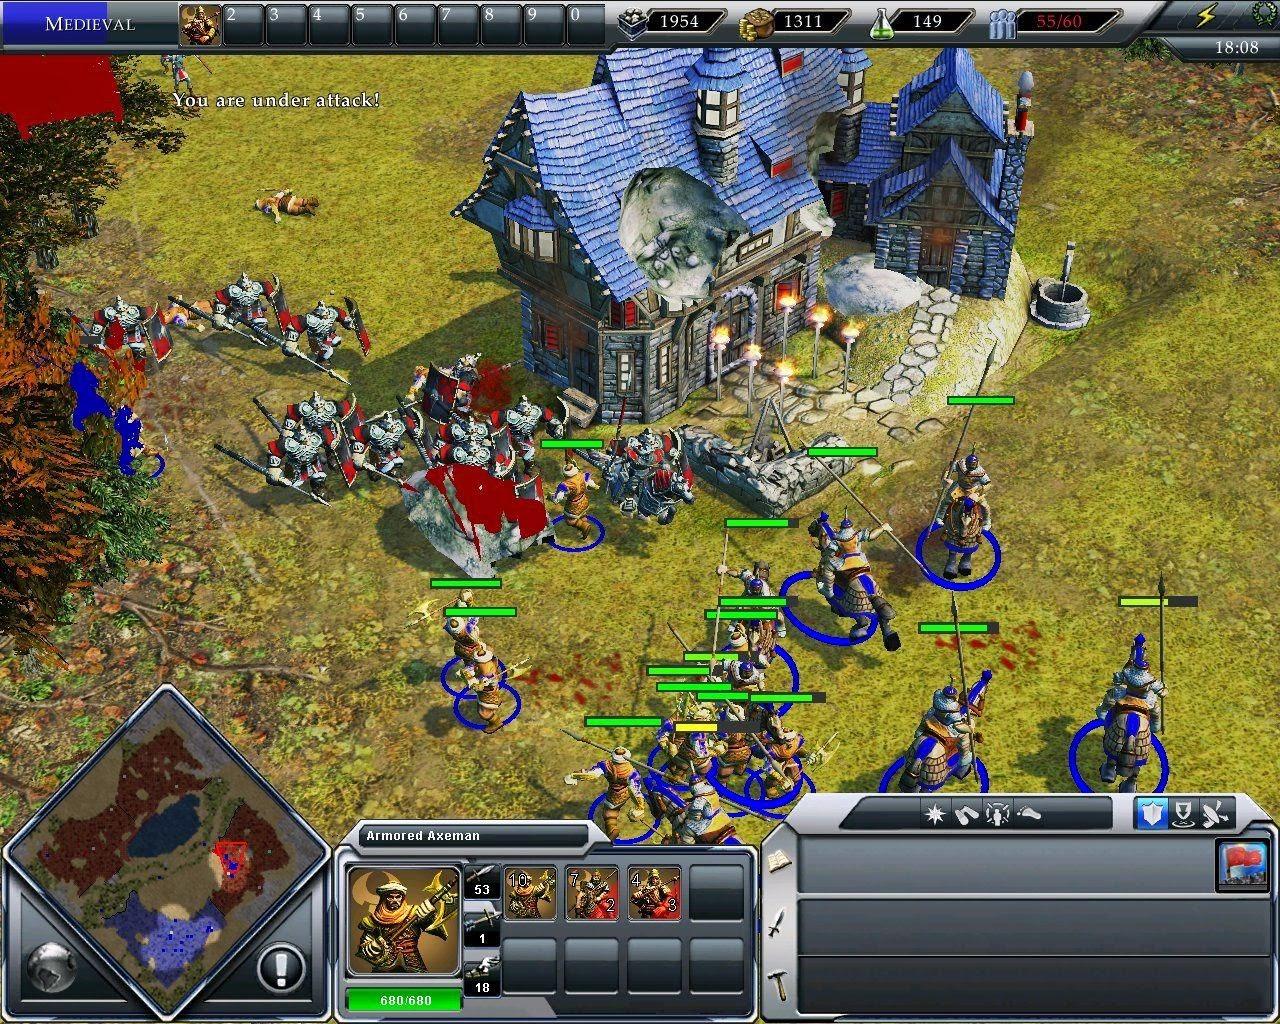 Empire Earth II: Gold Edition - Full Download (PC Windows